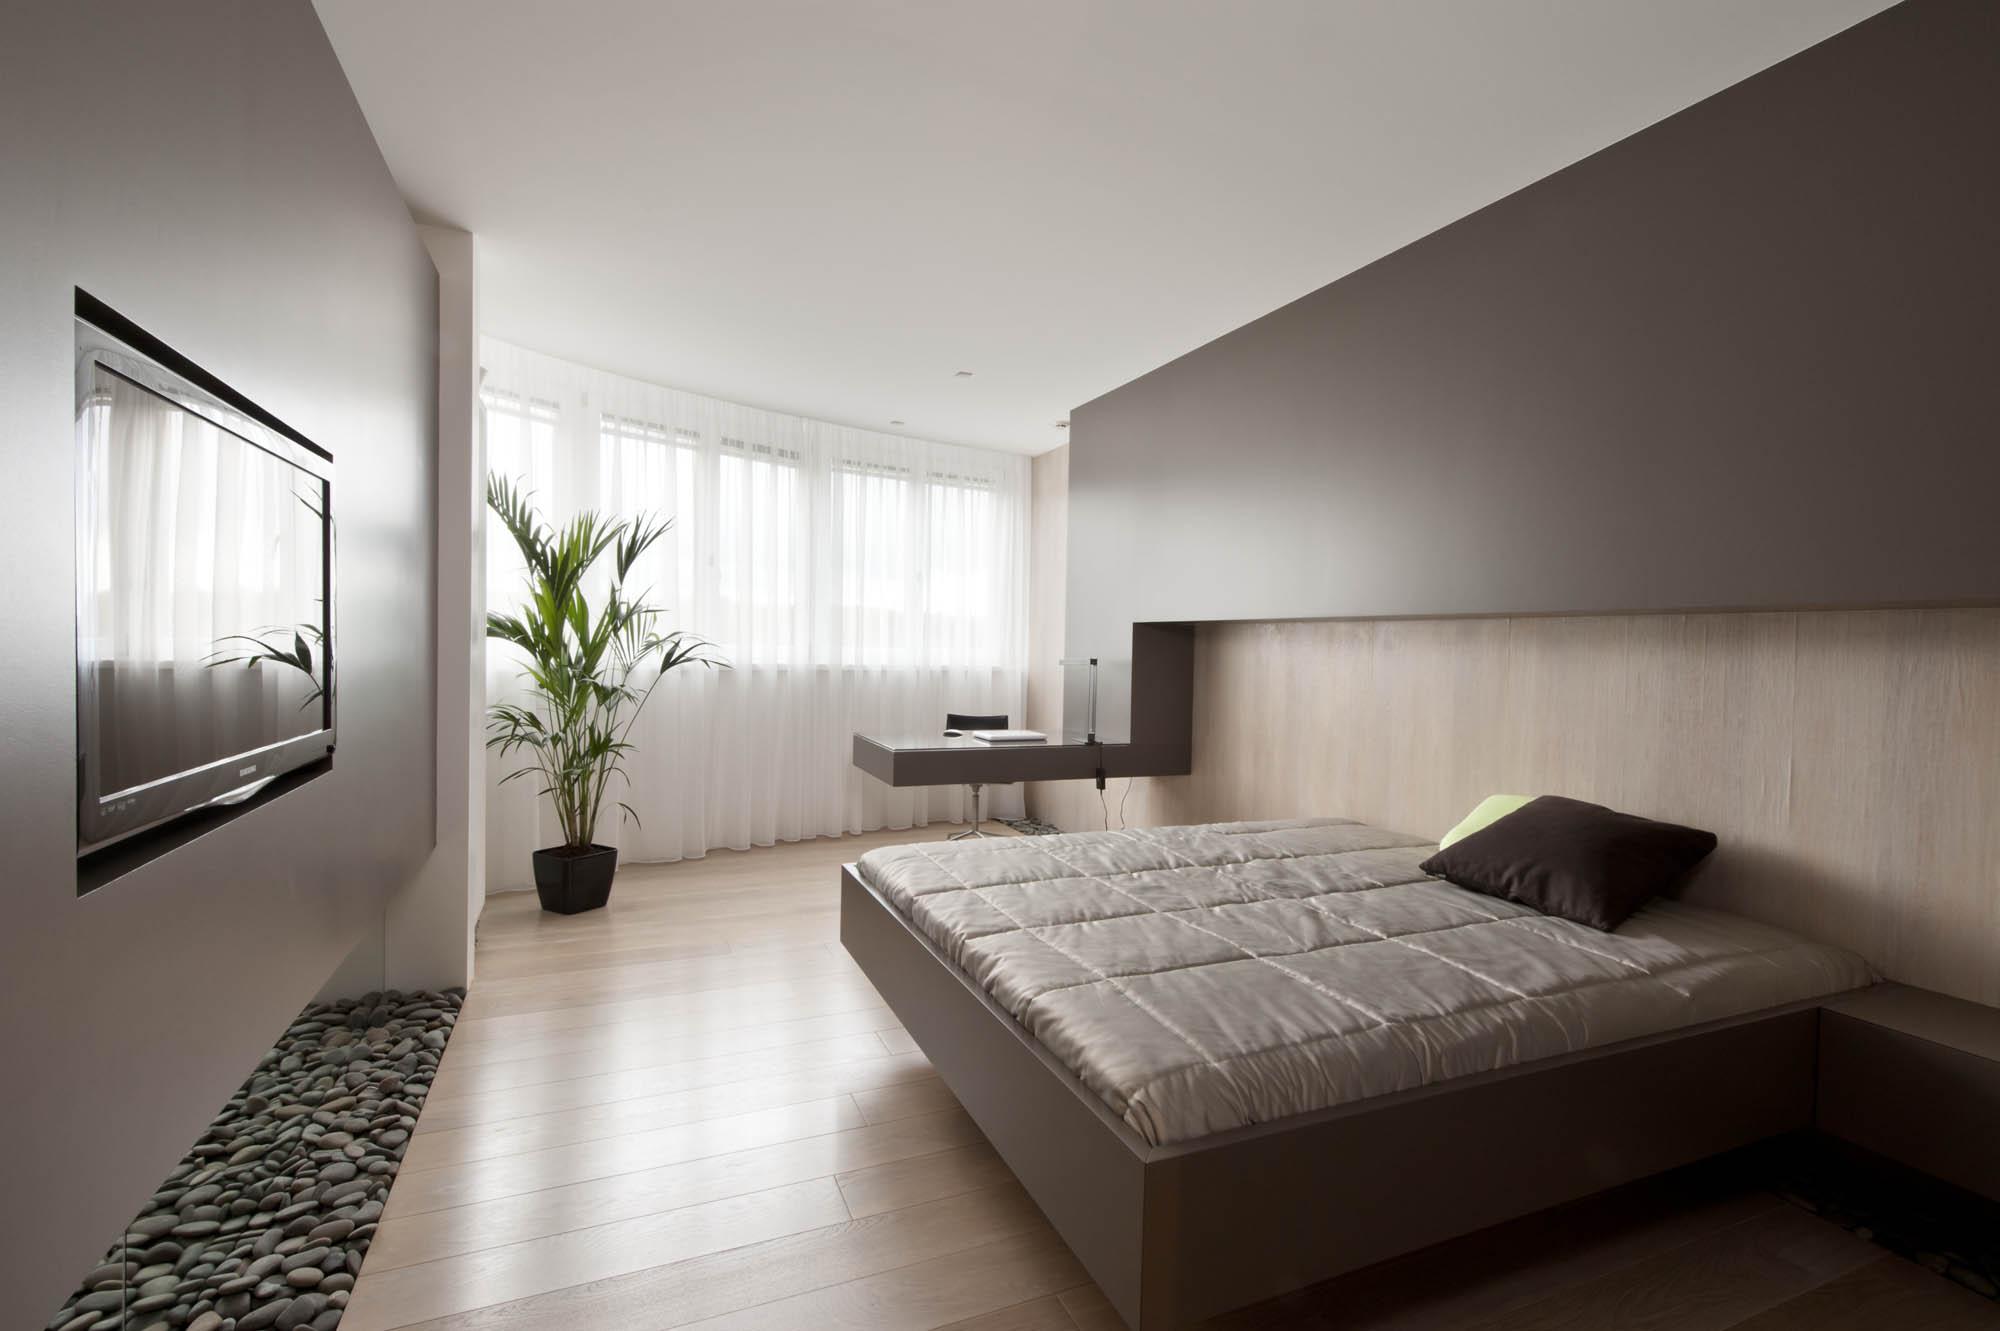 20 Best Small Modern Bedroom Ideas: 20 Idea Dekorasi Bilik Tidur Moden Pasti Buat Anda